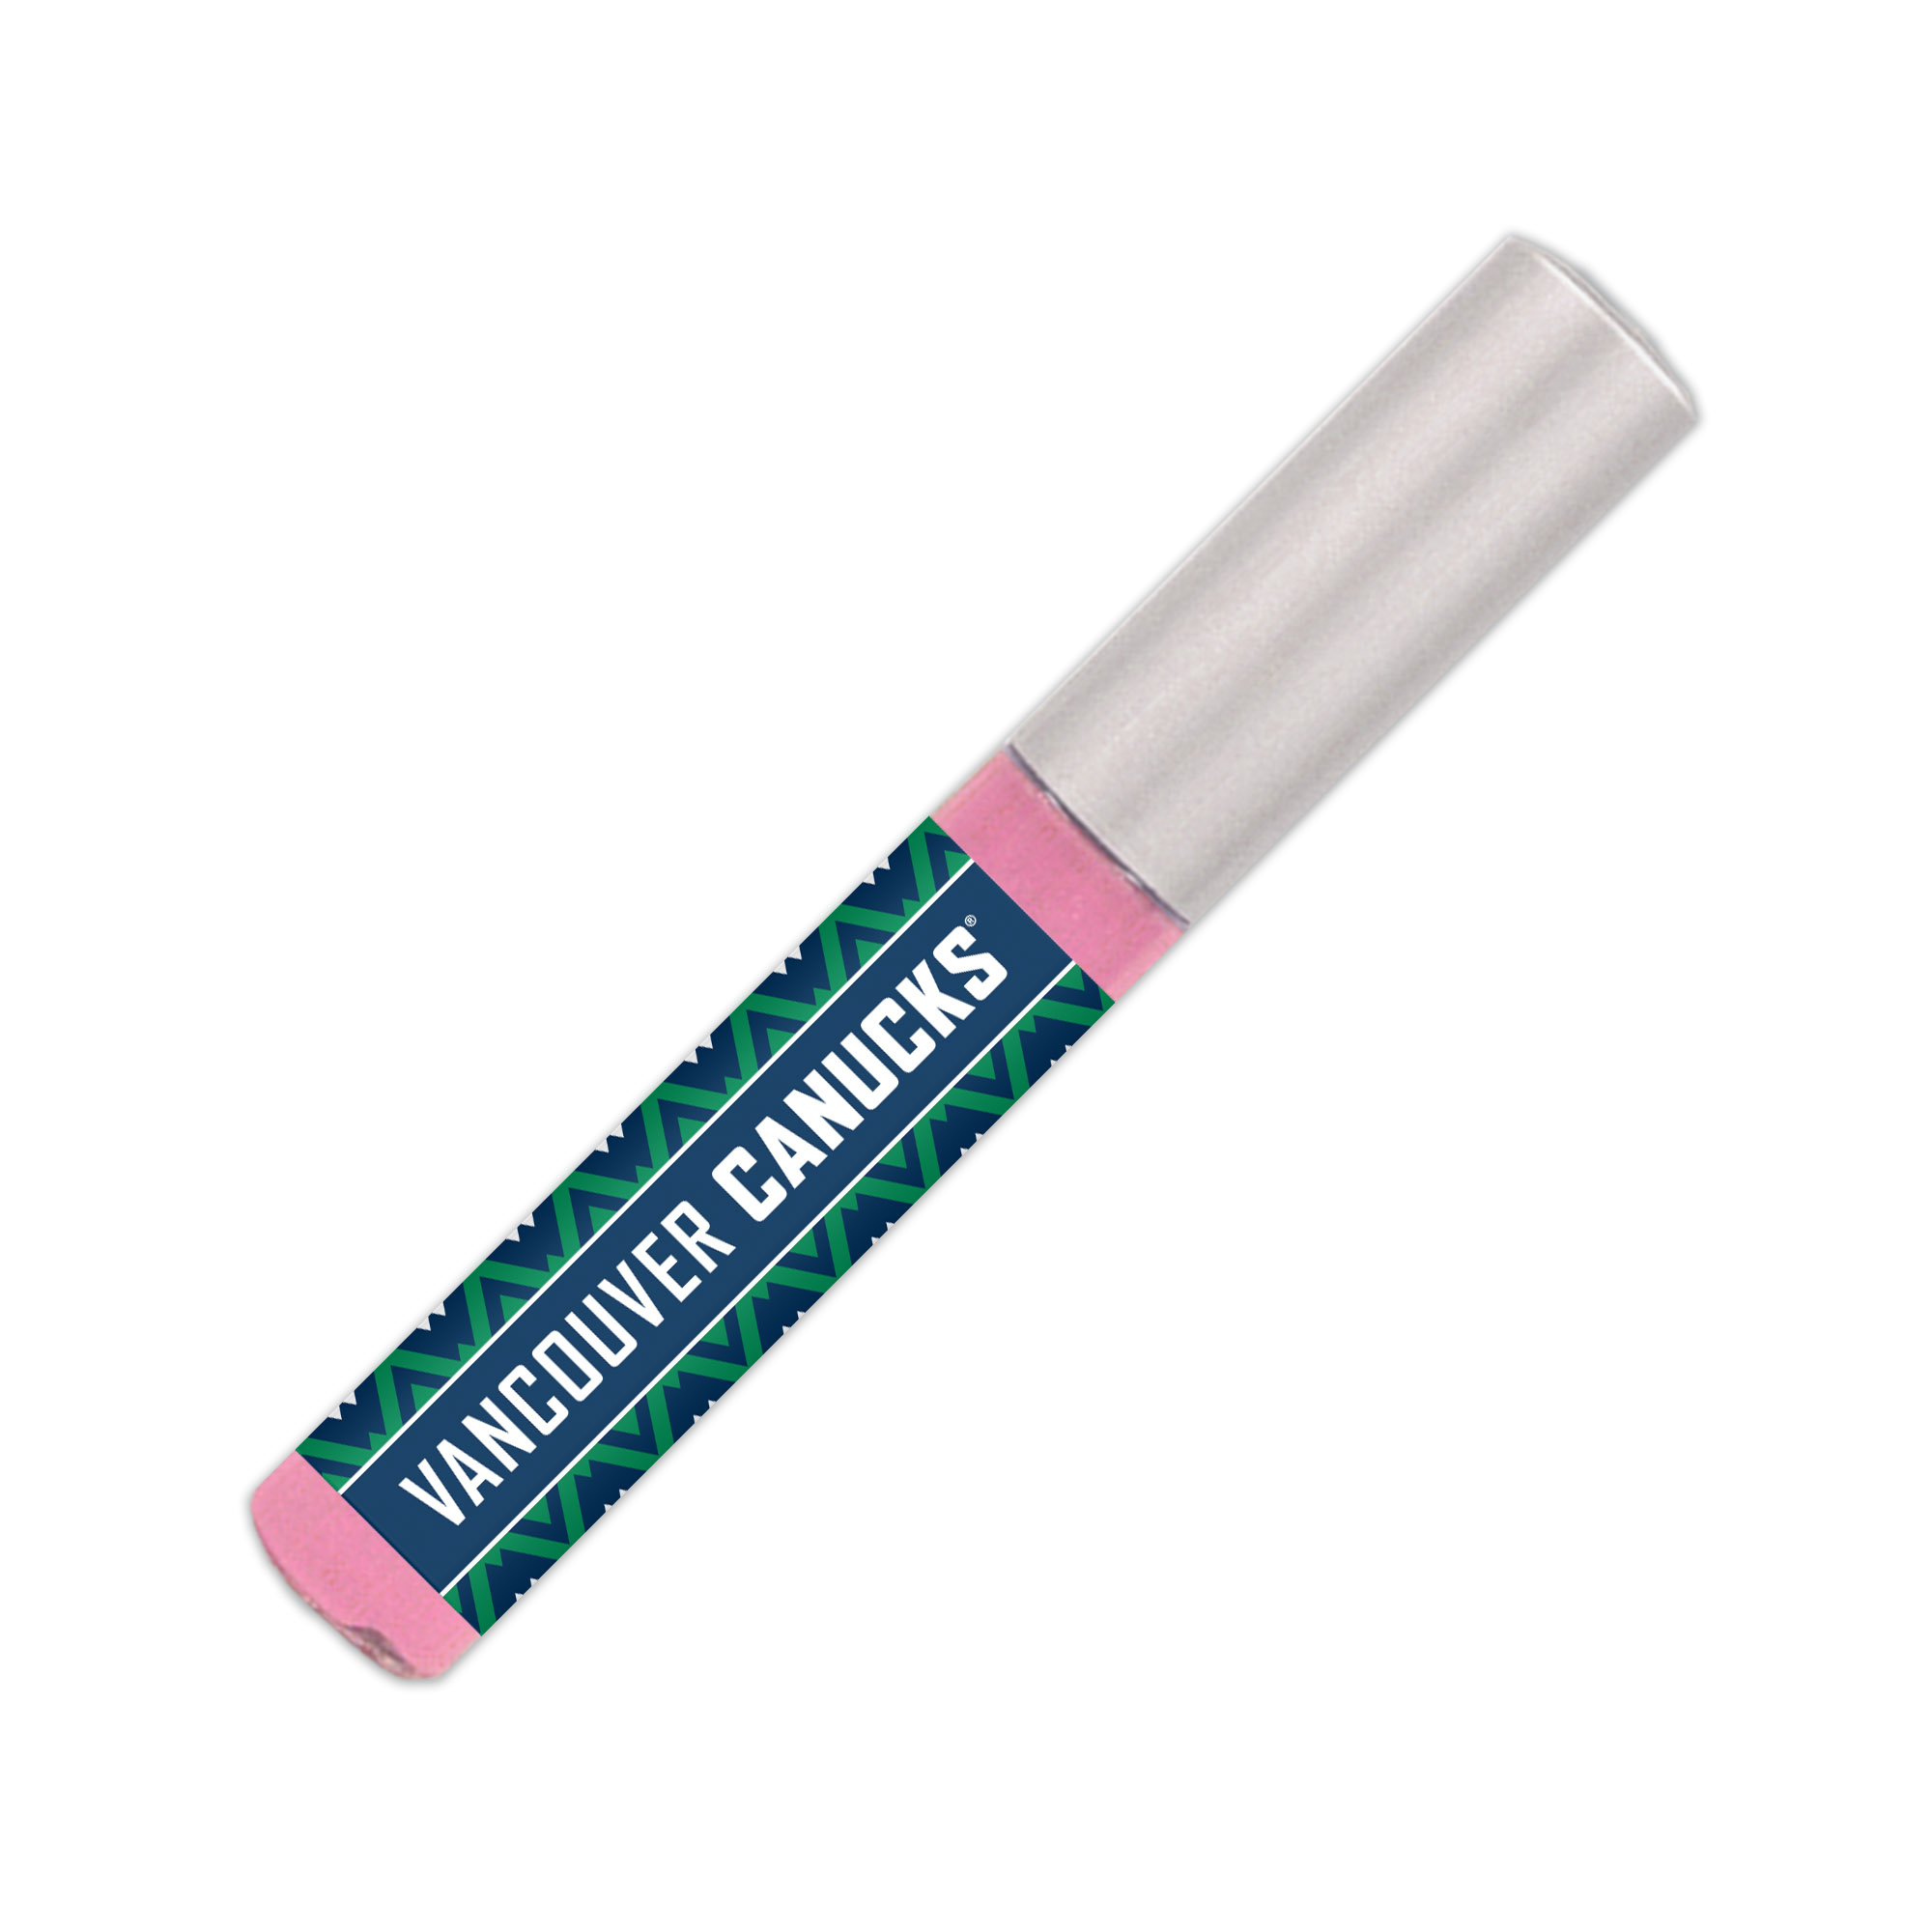 Vancouver Canucks Bubble Gum Lip Gloss - No Size